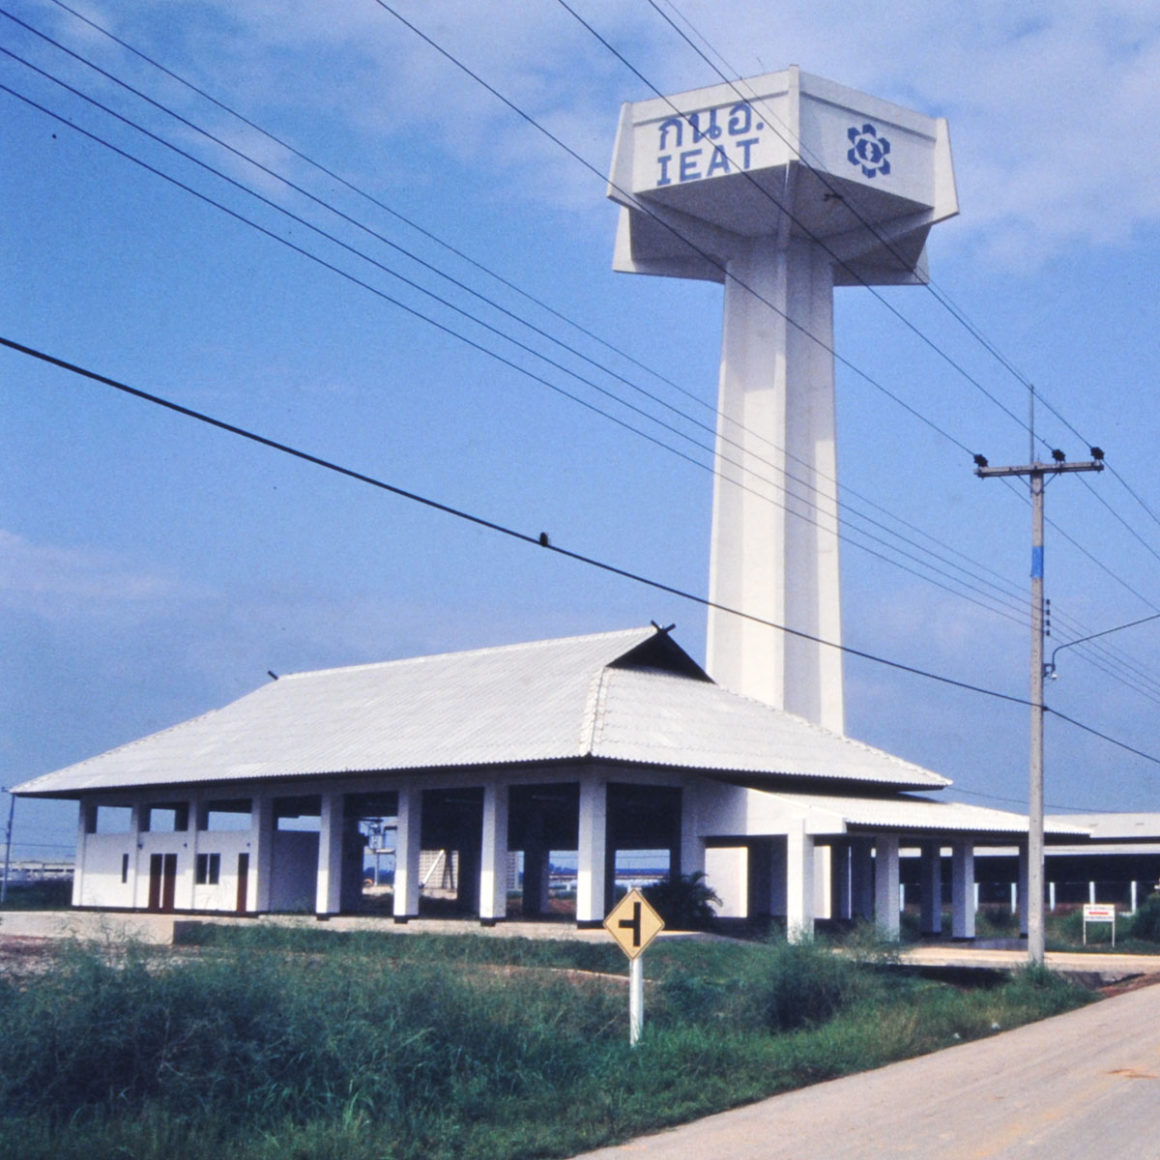 Industrial Estate: Northern Industrial Estate of IEAT